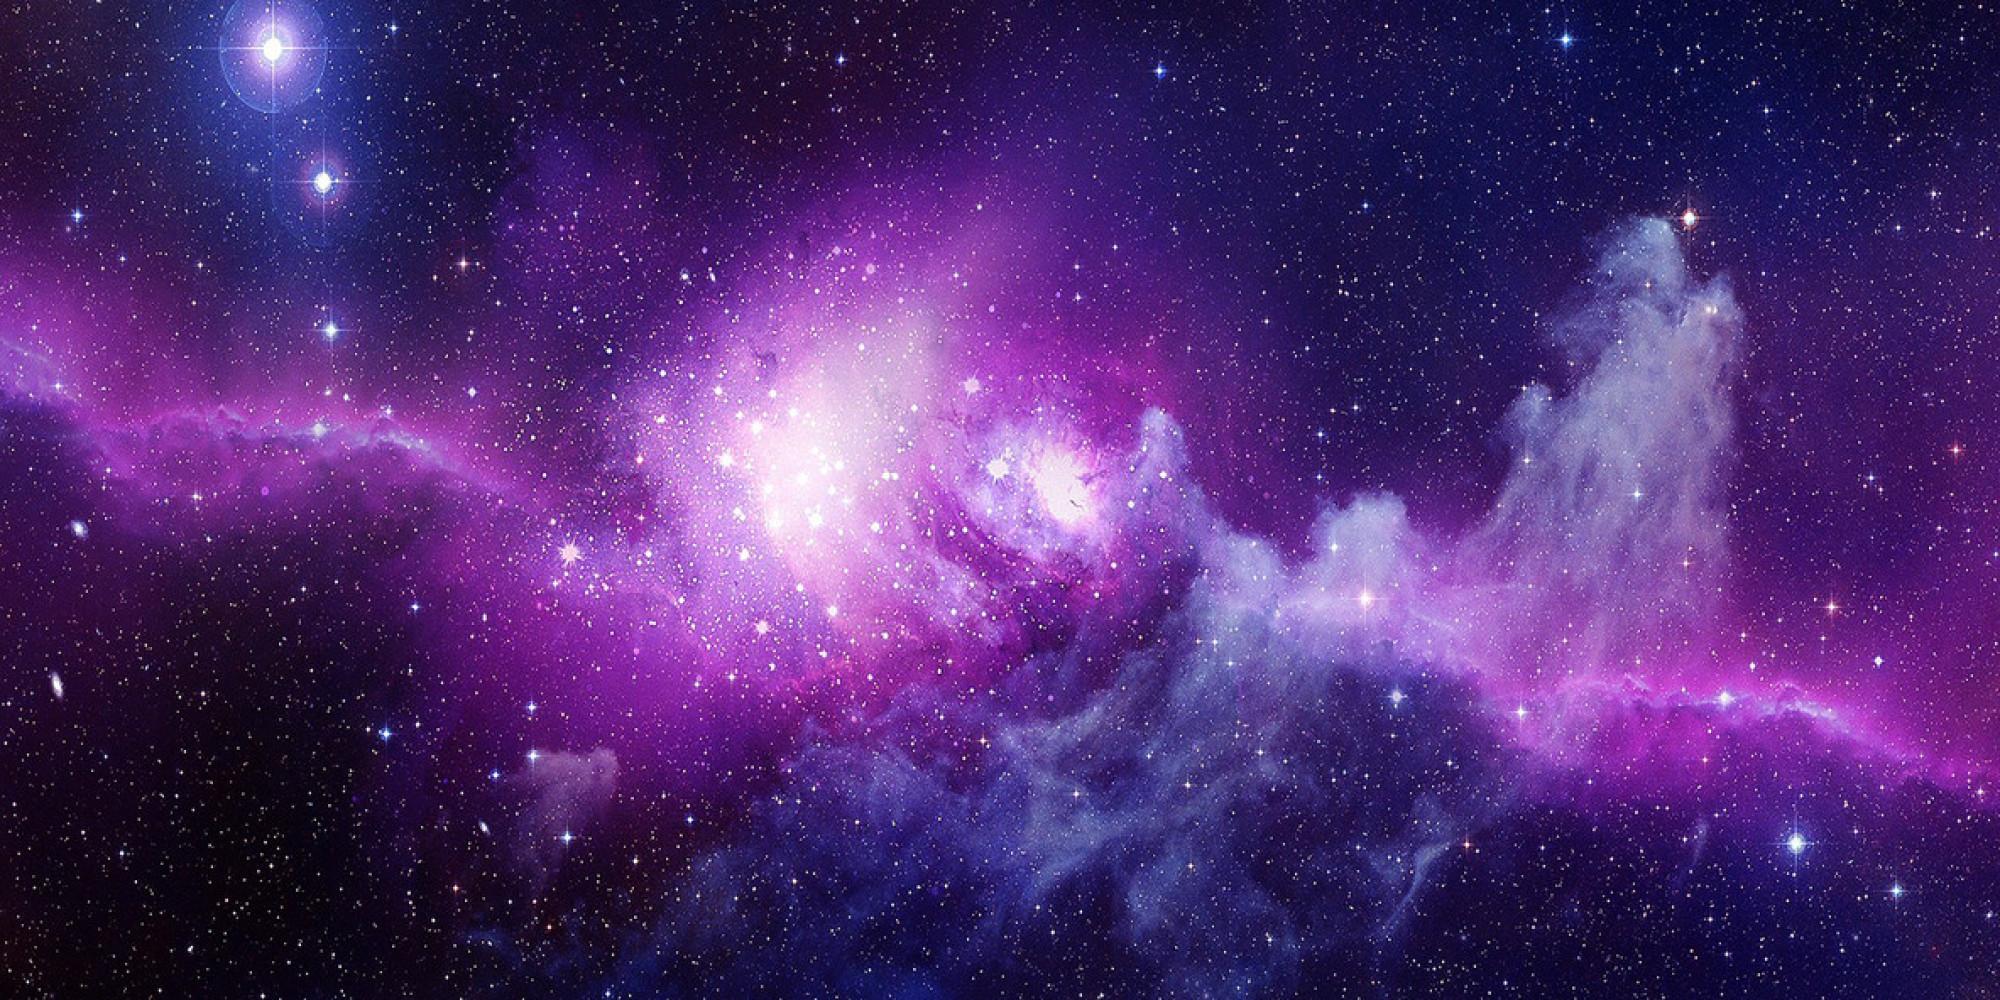 L 39 expansion de l 39 univers enfin expliqu e for Espacio exterior 4k